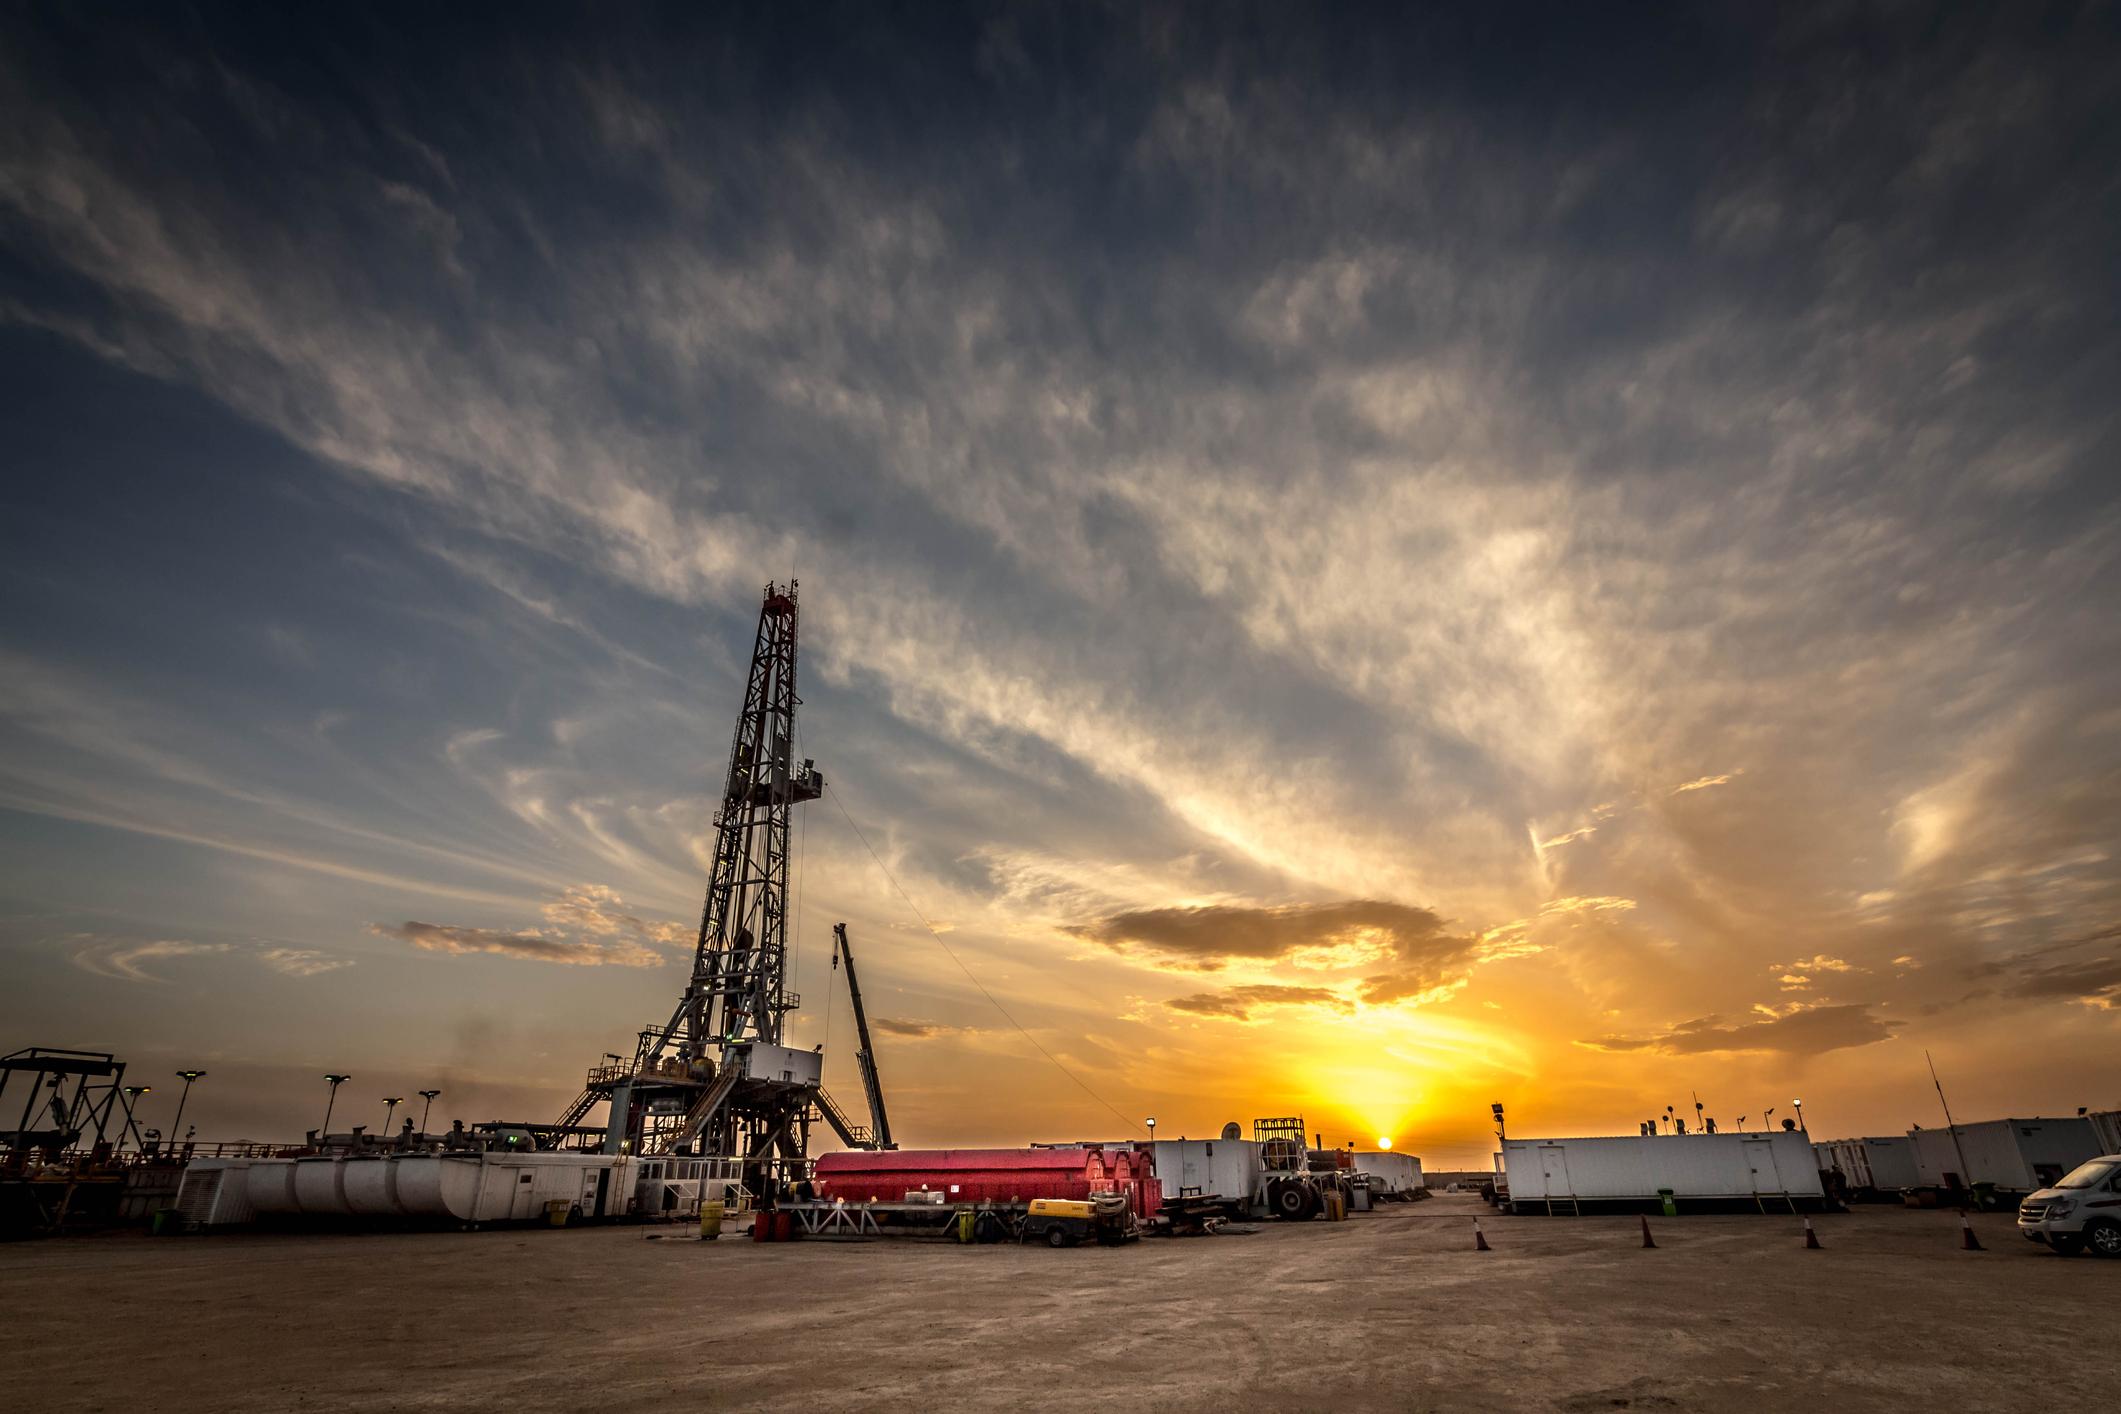 Drilling rig at dusk